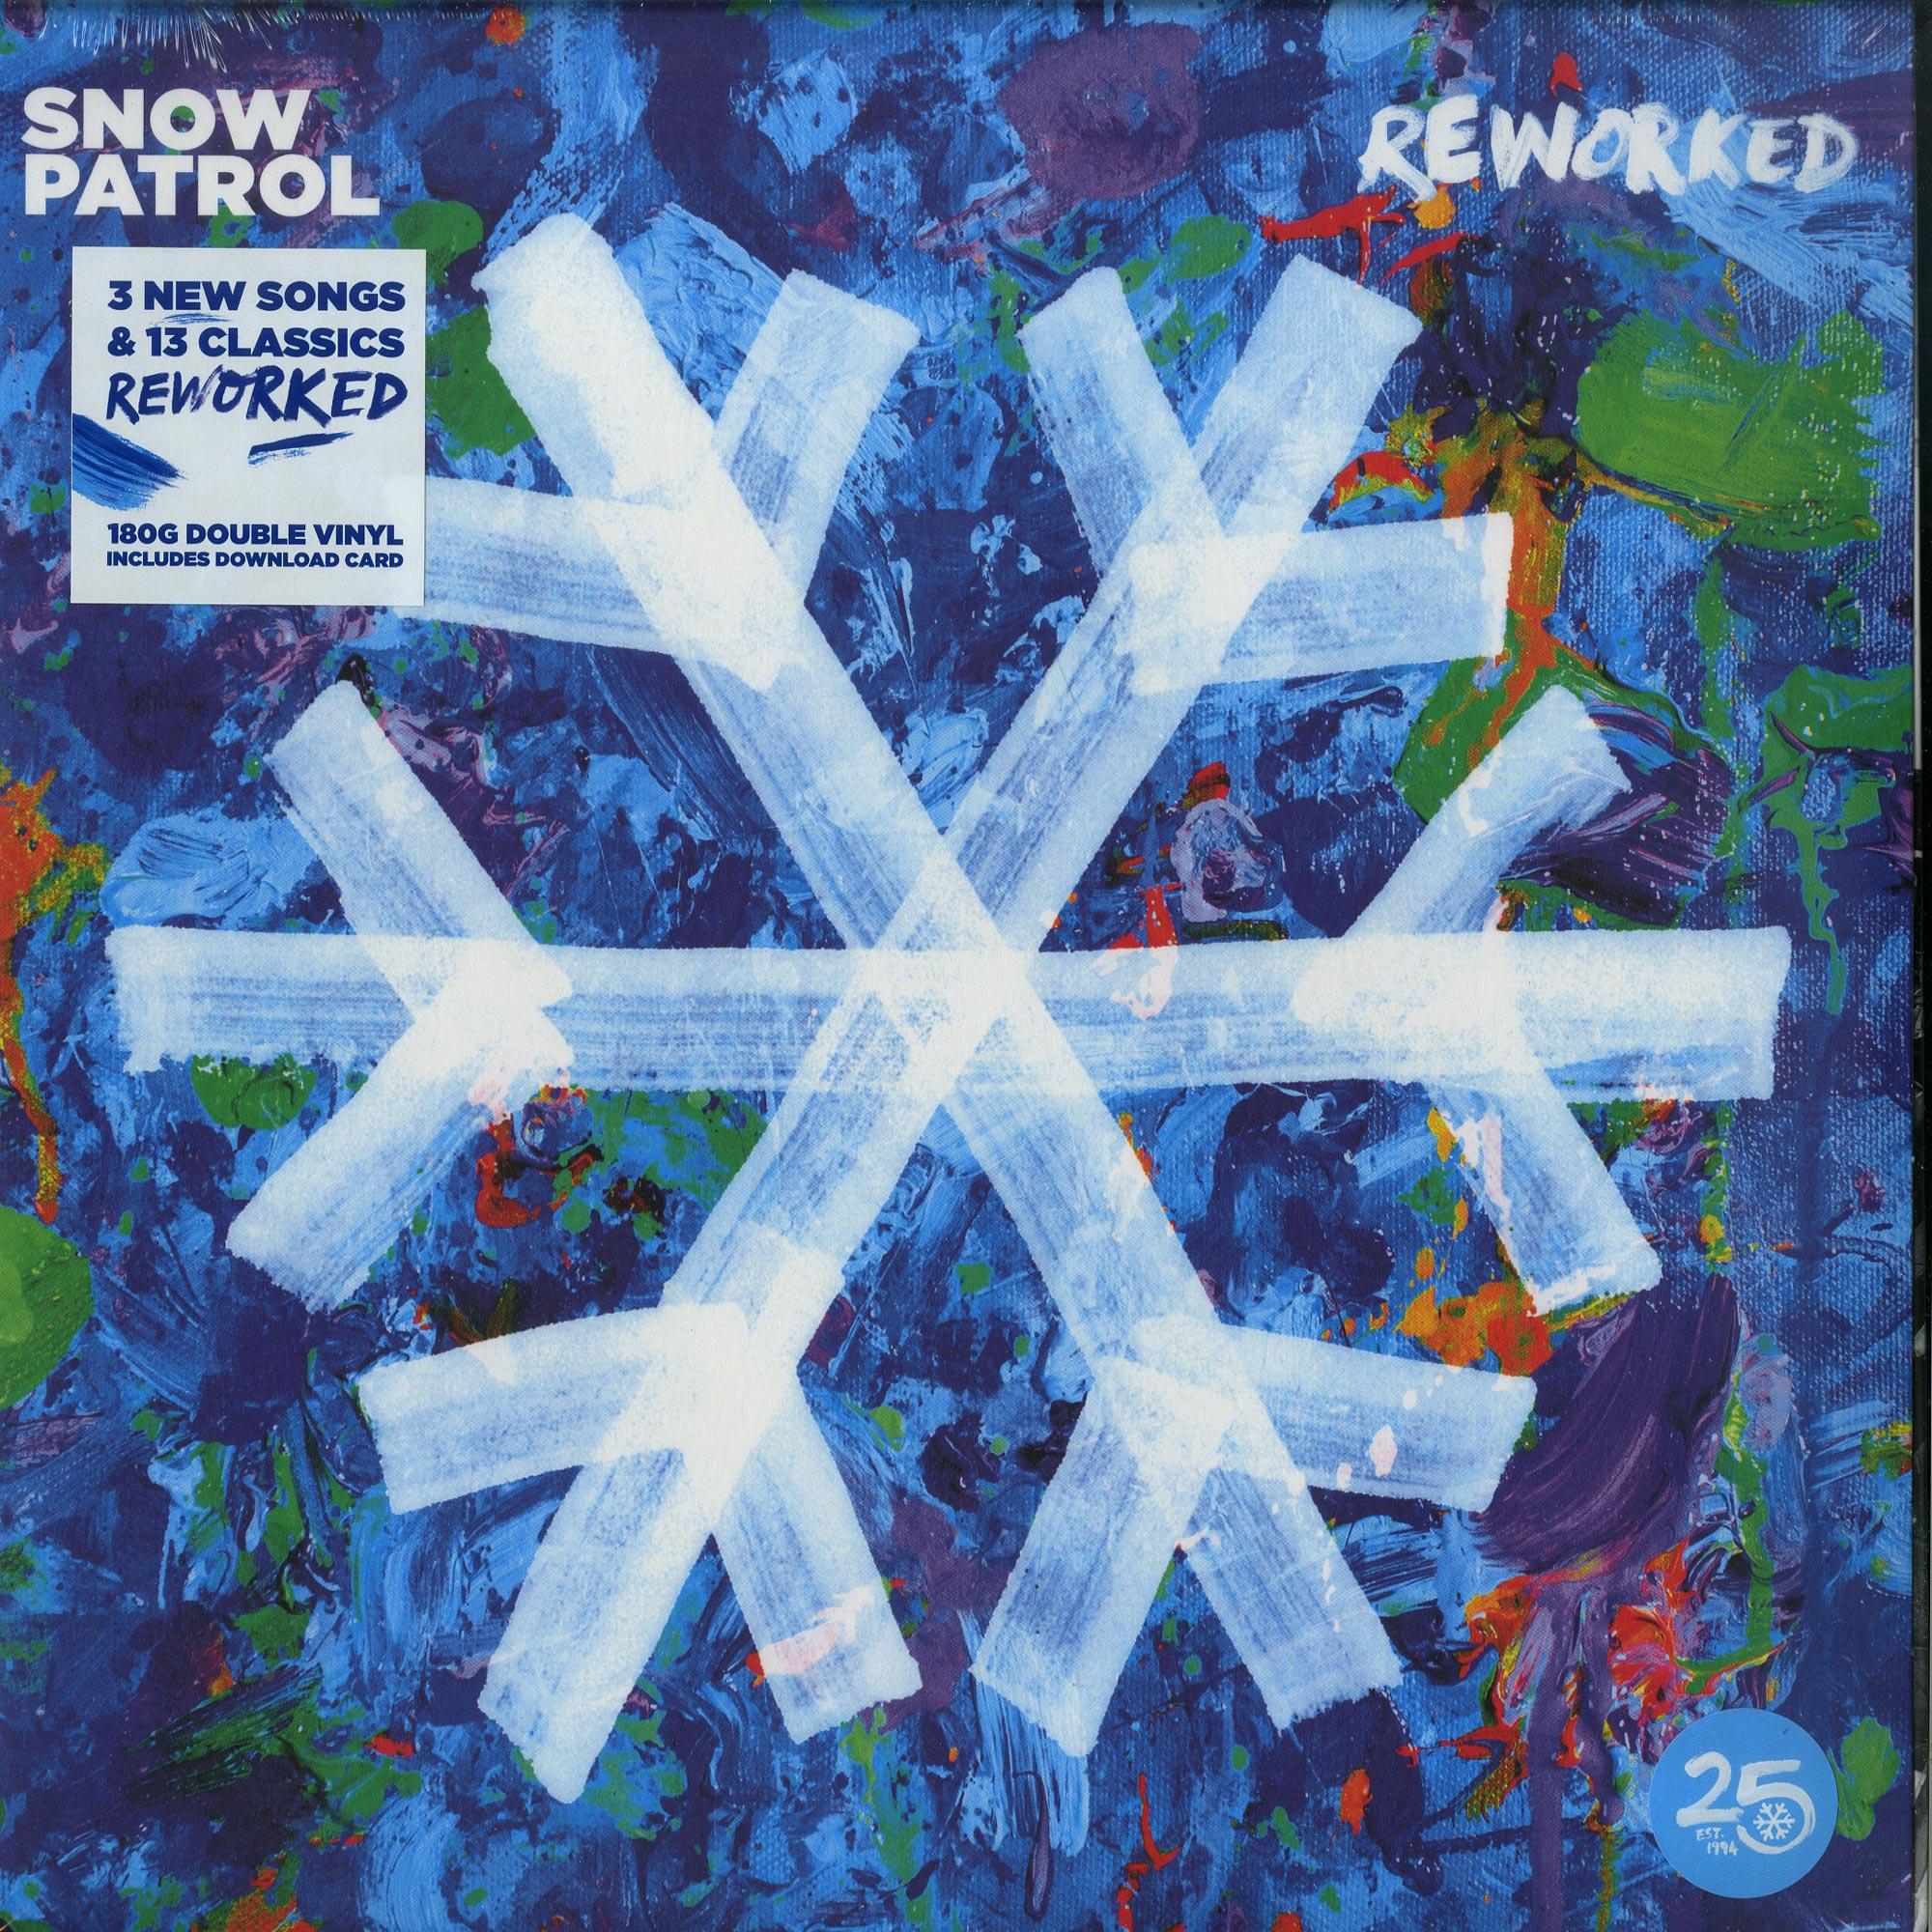 Snow Patrol - SNOW PATROL - REWORKED